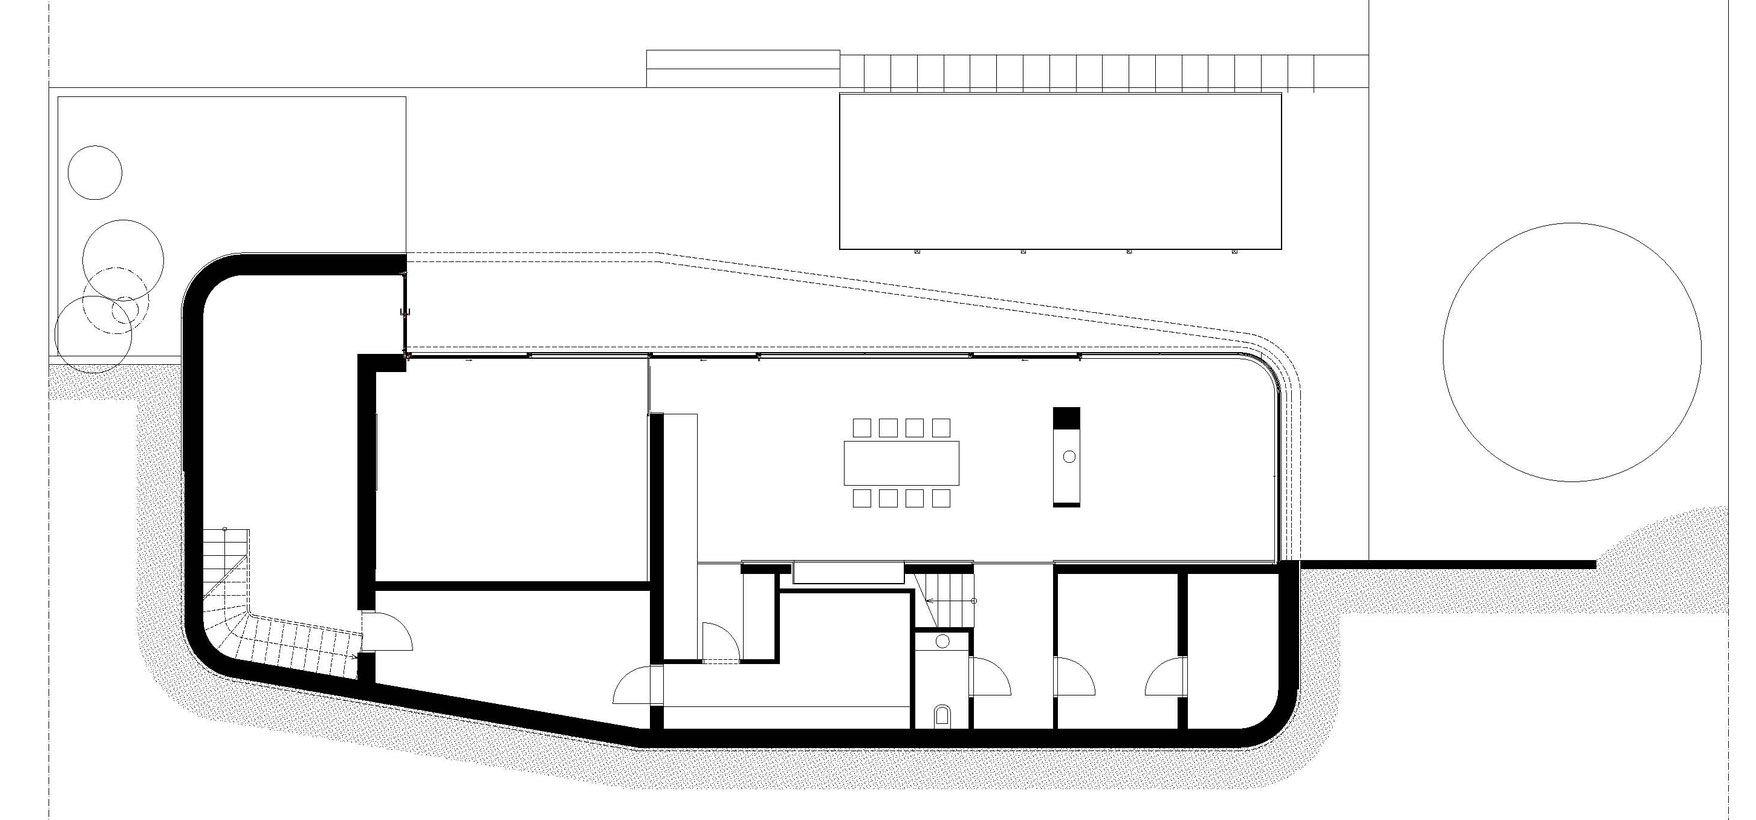 House L By Schneider Amp Lengauer